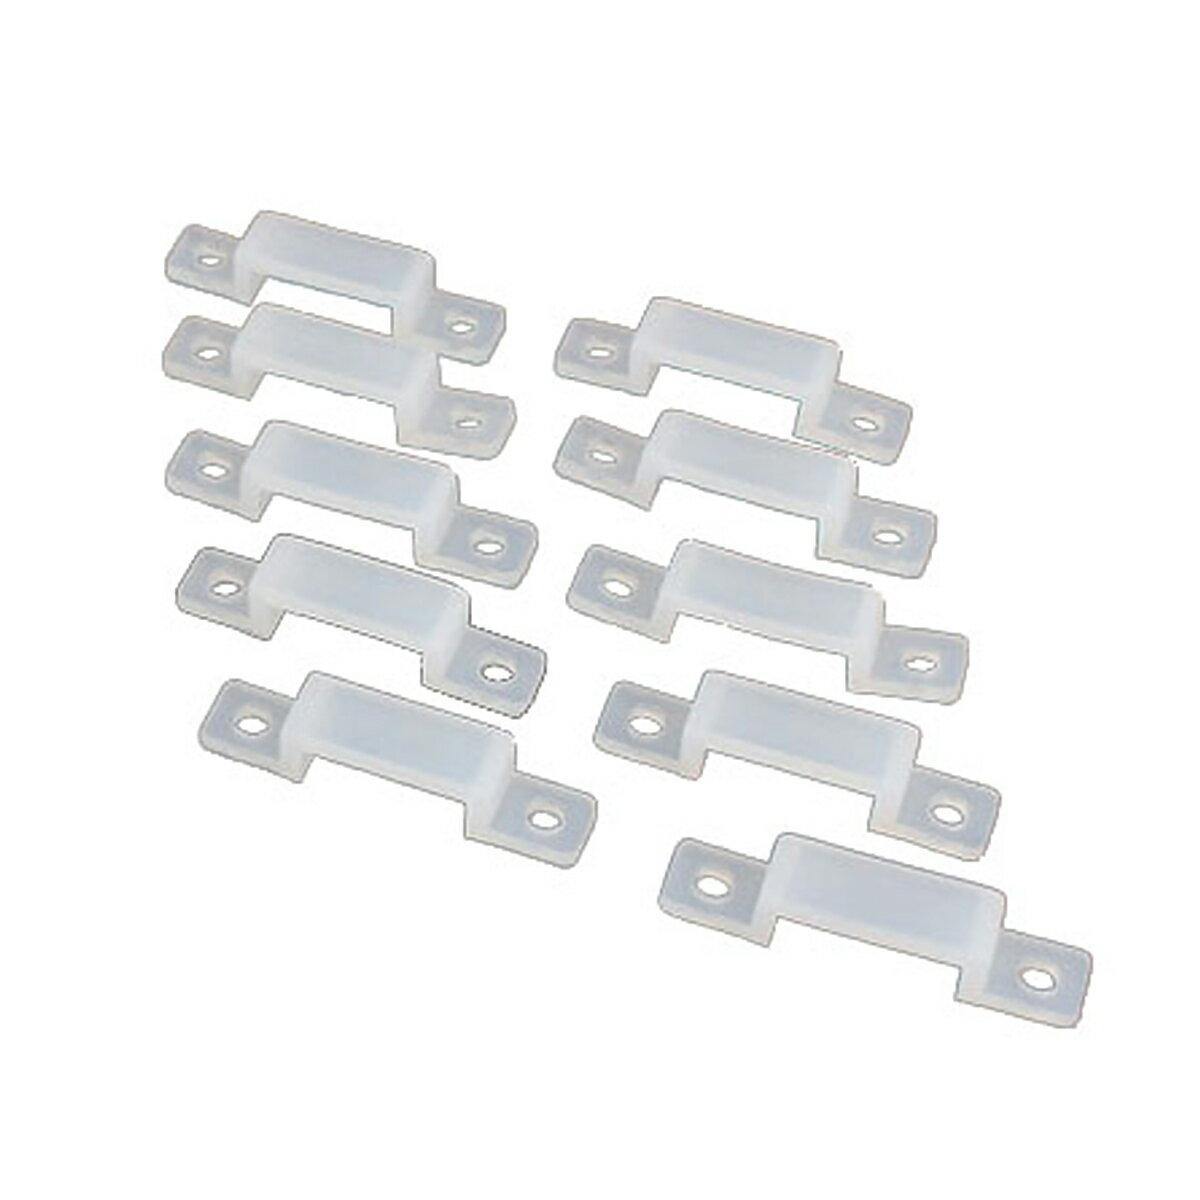 LEDテープ用 サドル 固定クリップ 留め具 1...の商品画像